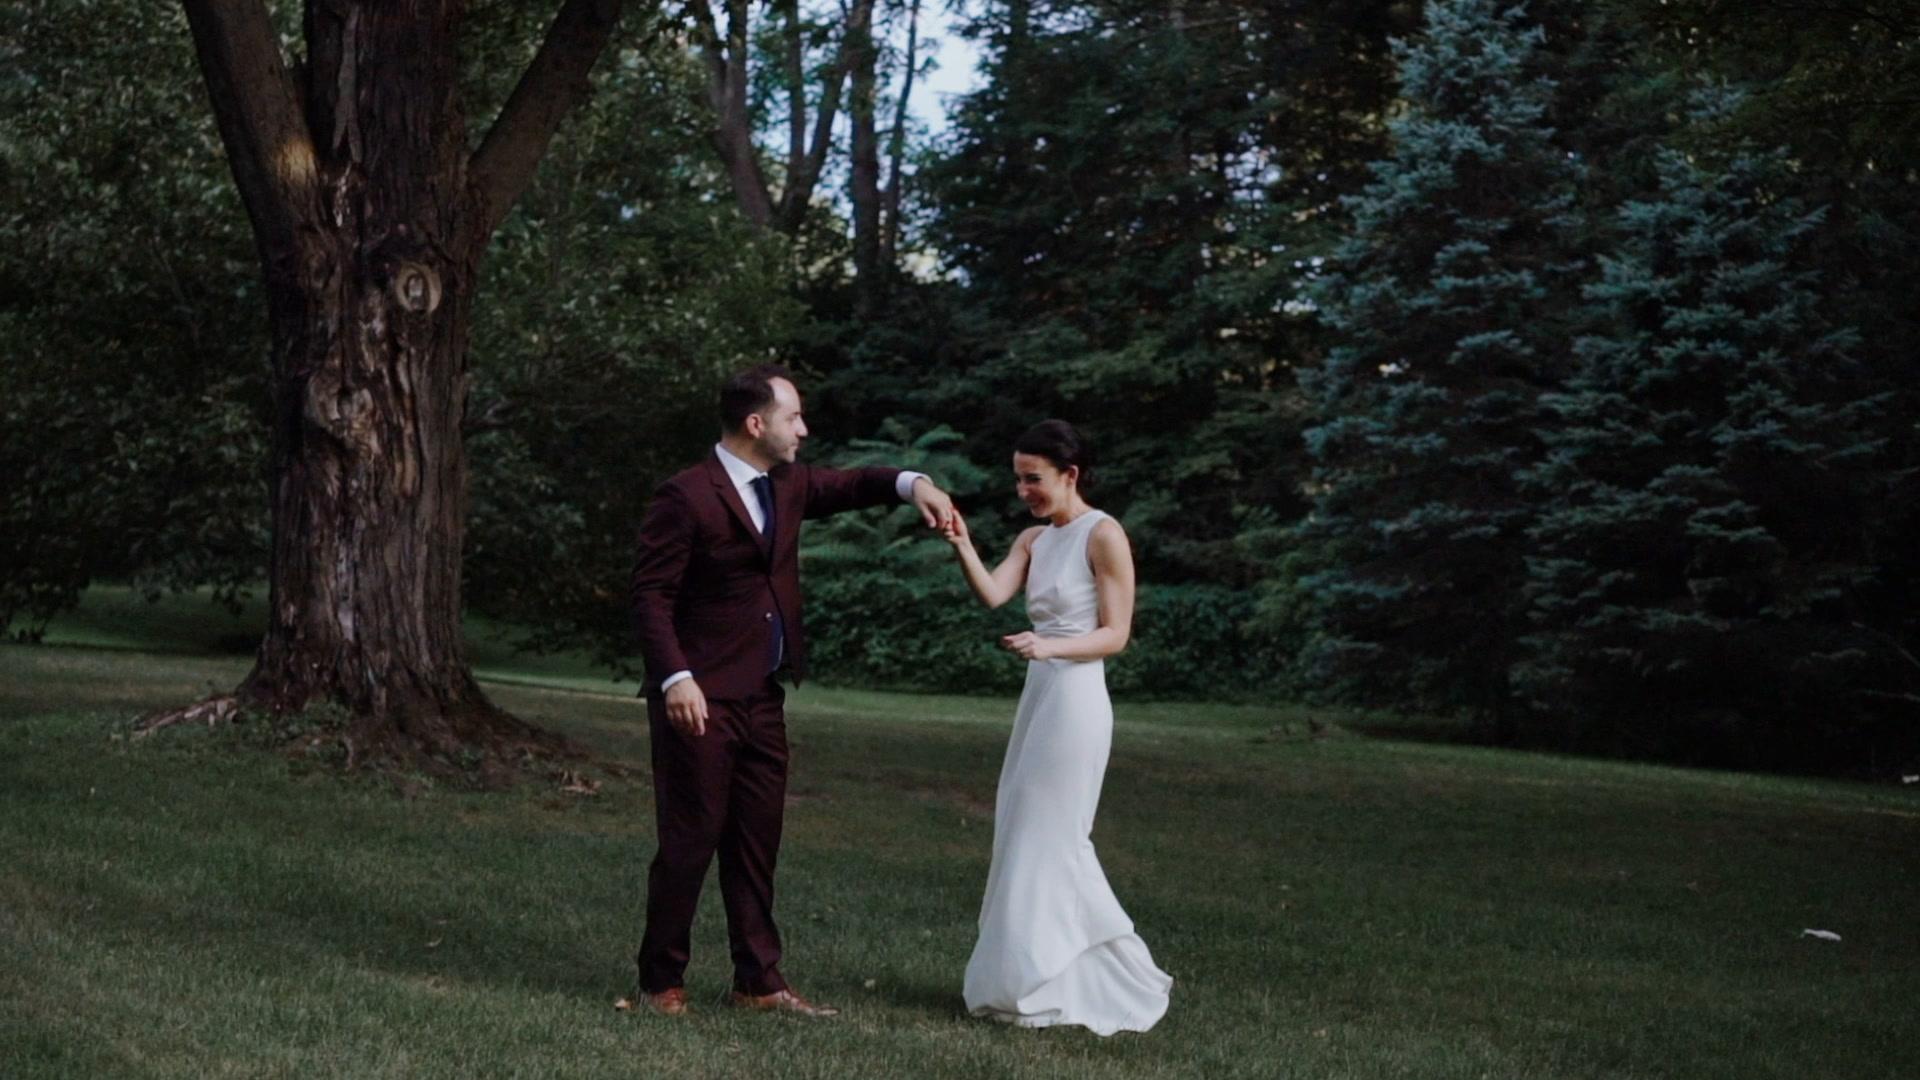 Melissa + Nick | Stone Ridge, New York | Hasbrouck House